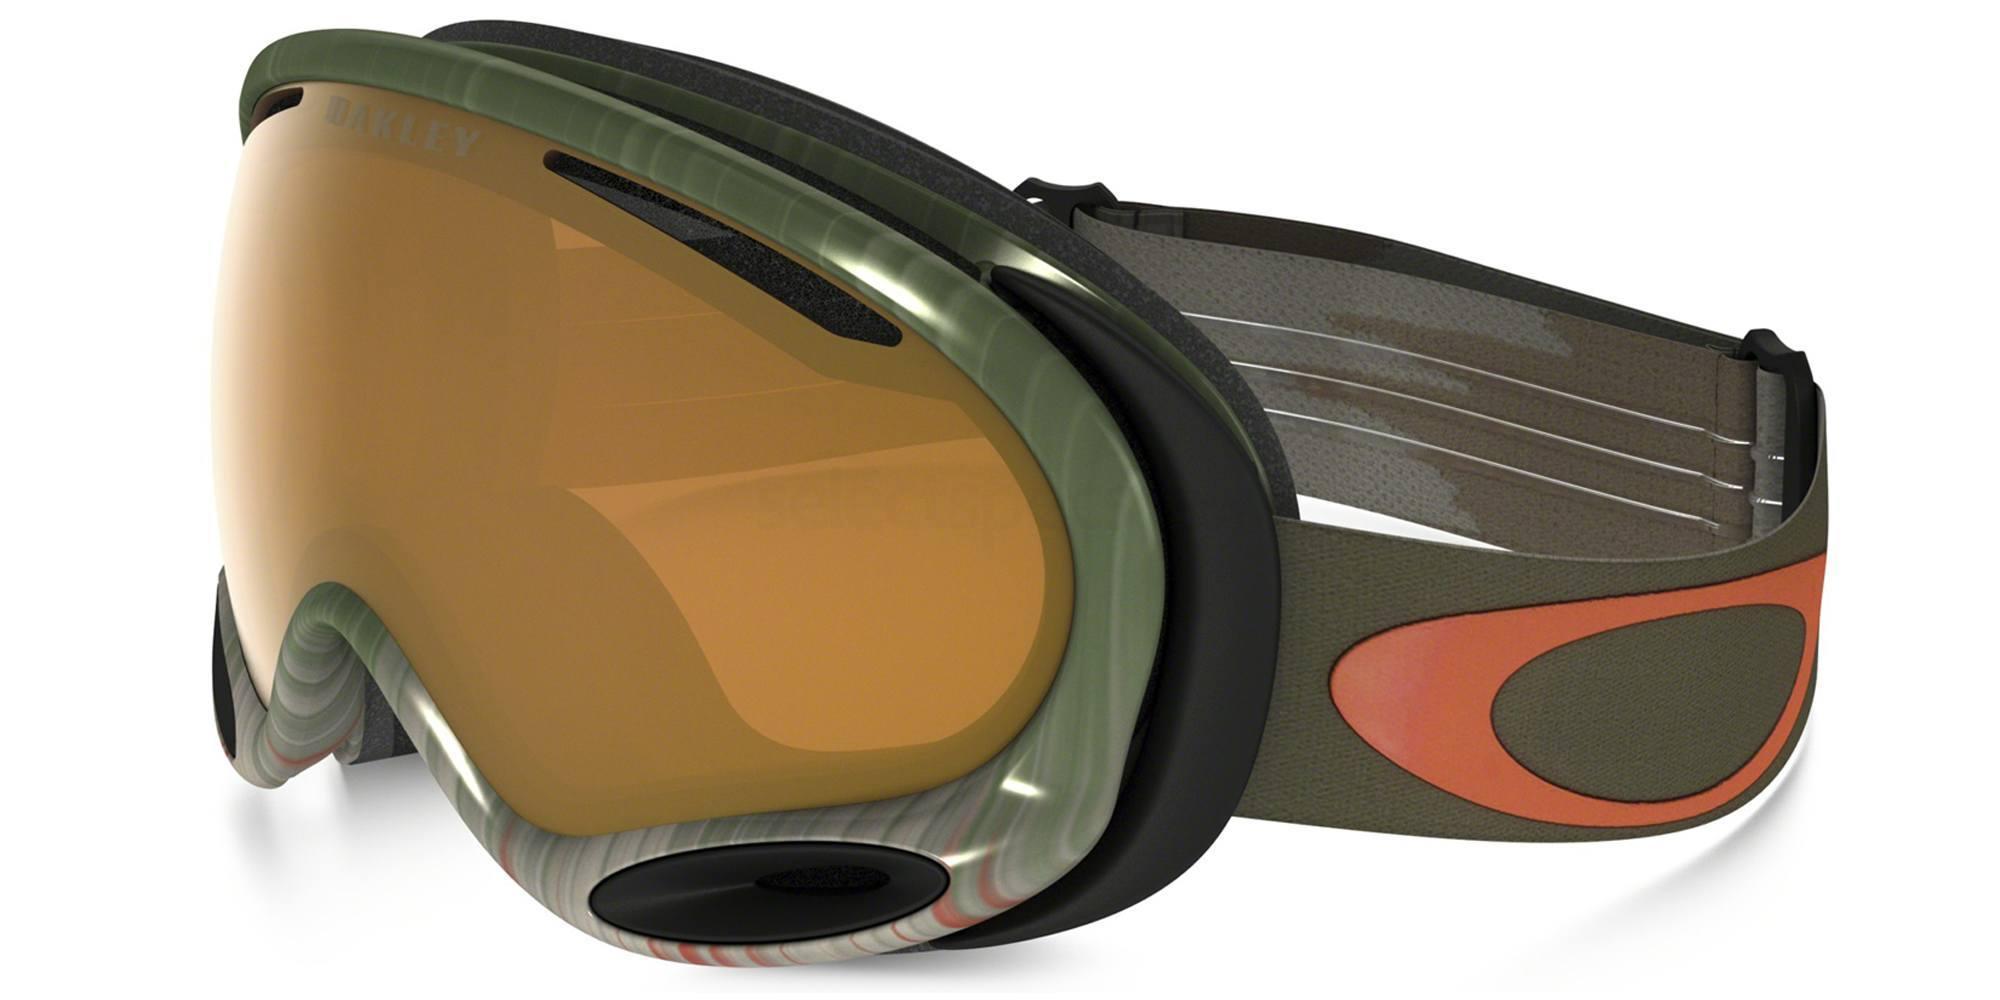 Oakley OO7044 A-FRAME 2.0 goggles